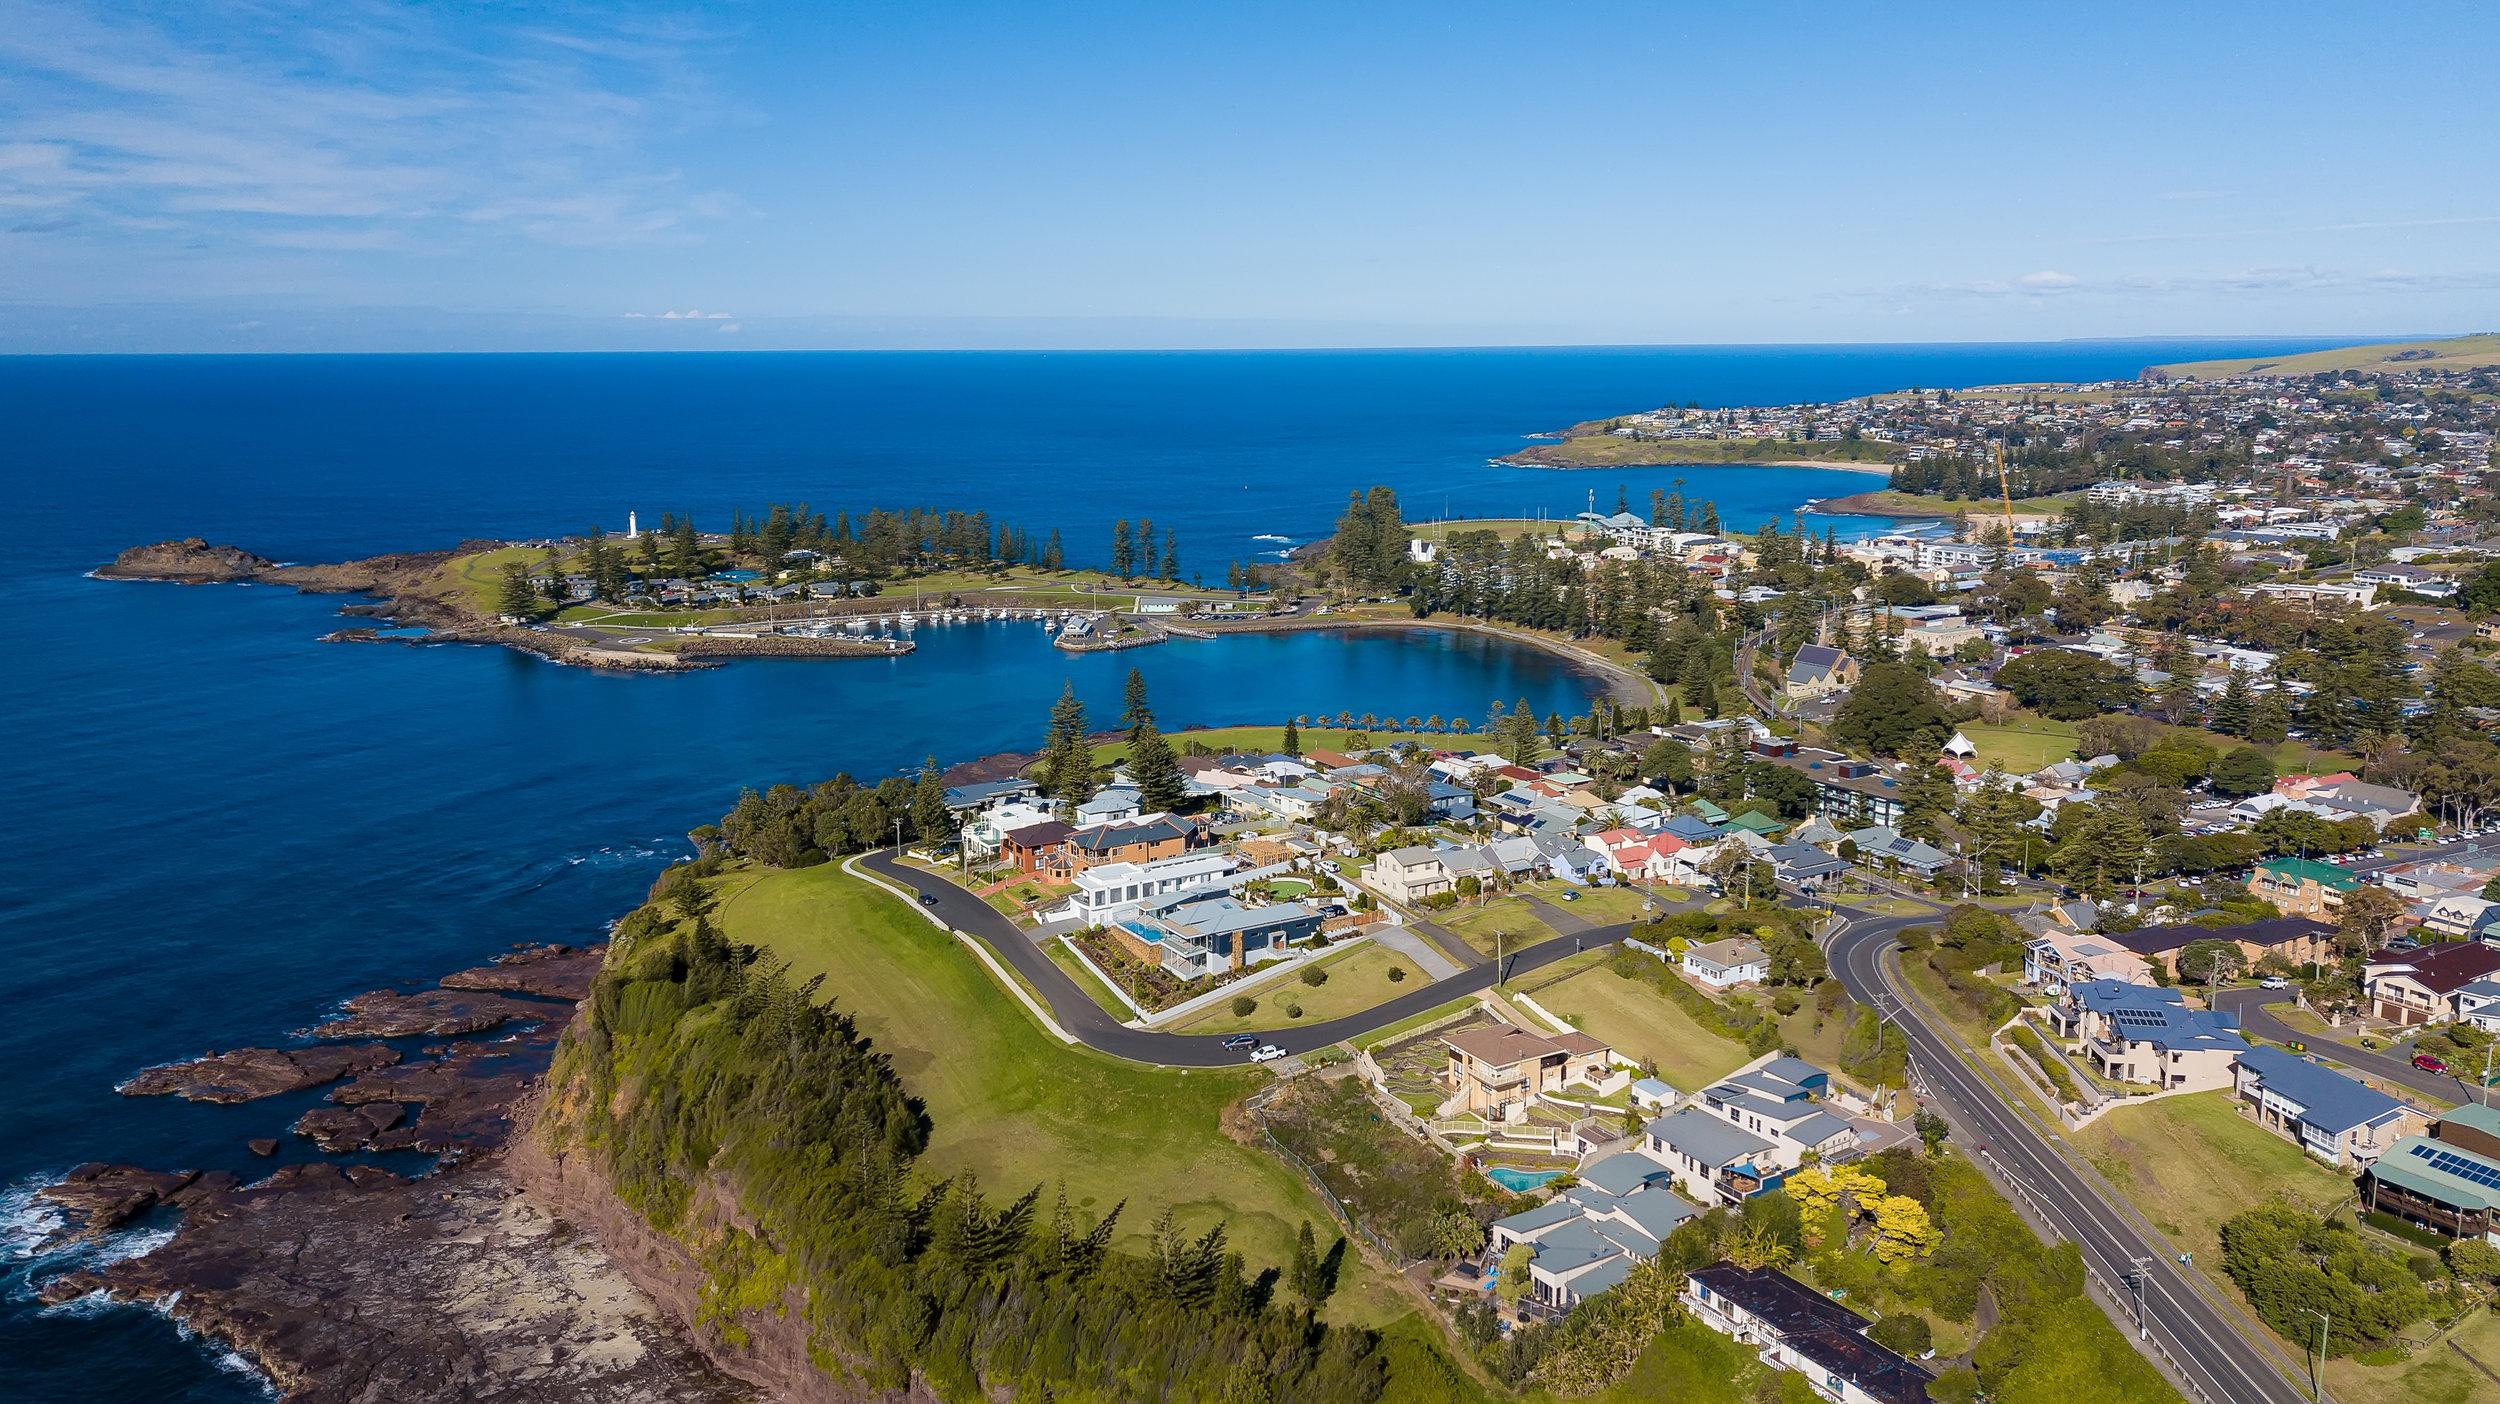 Kiama Shellharbour Gerringong Berry Wollongong South Coast Illawarra Drone Photographer13.jpg